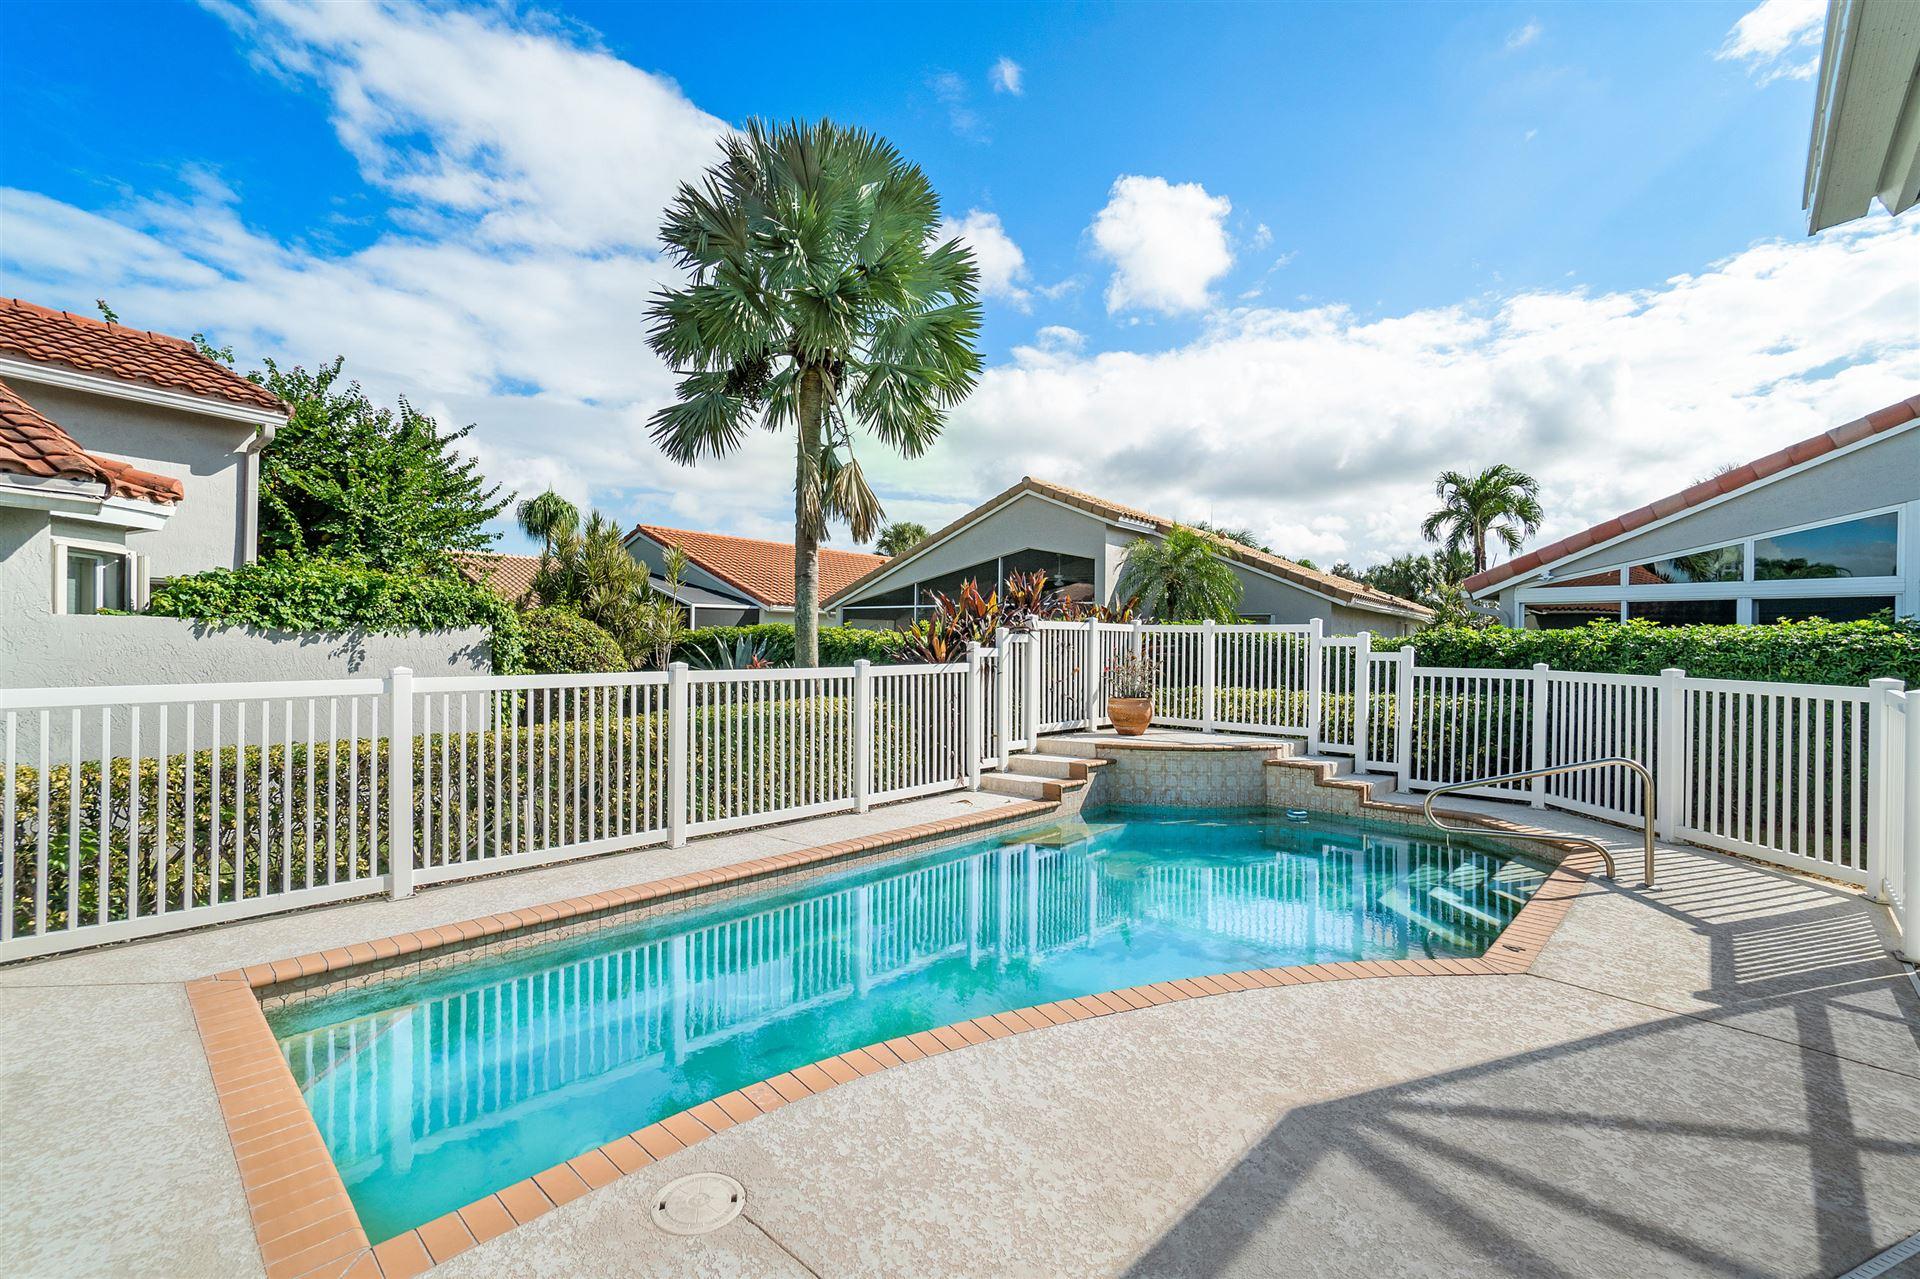 7266 Toscane Court, Boynton Beach, FL 33437 - #: RX-10672324